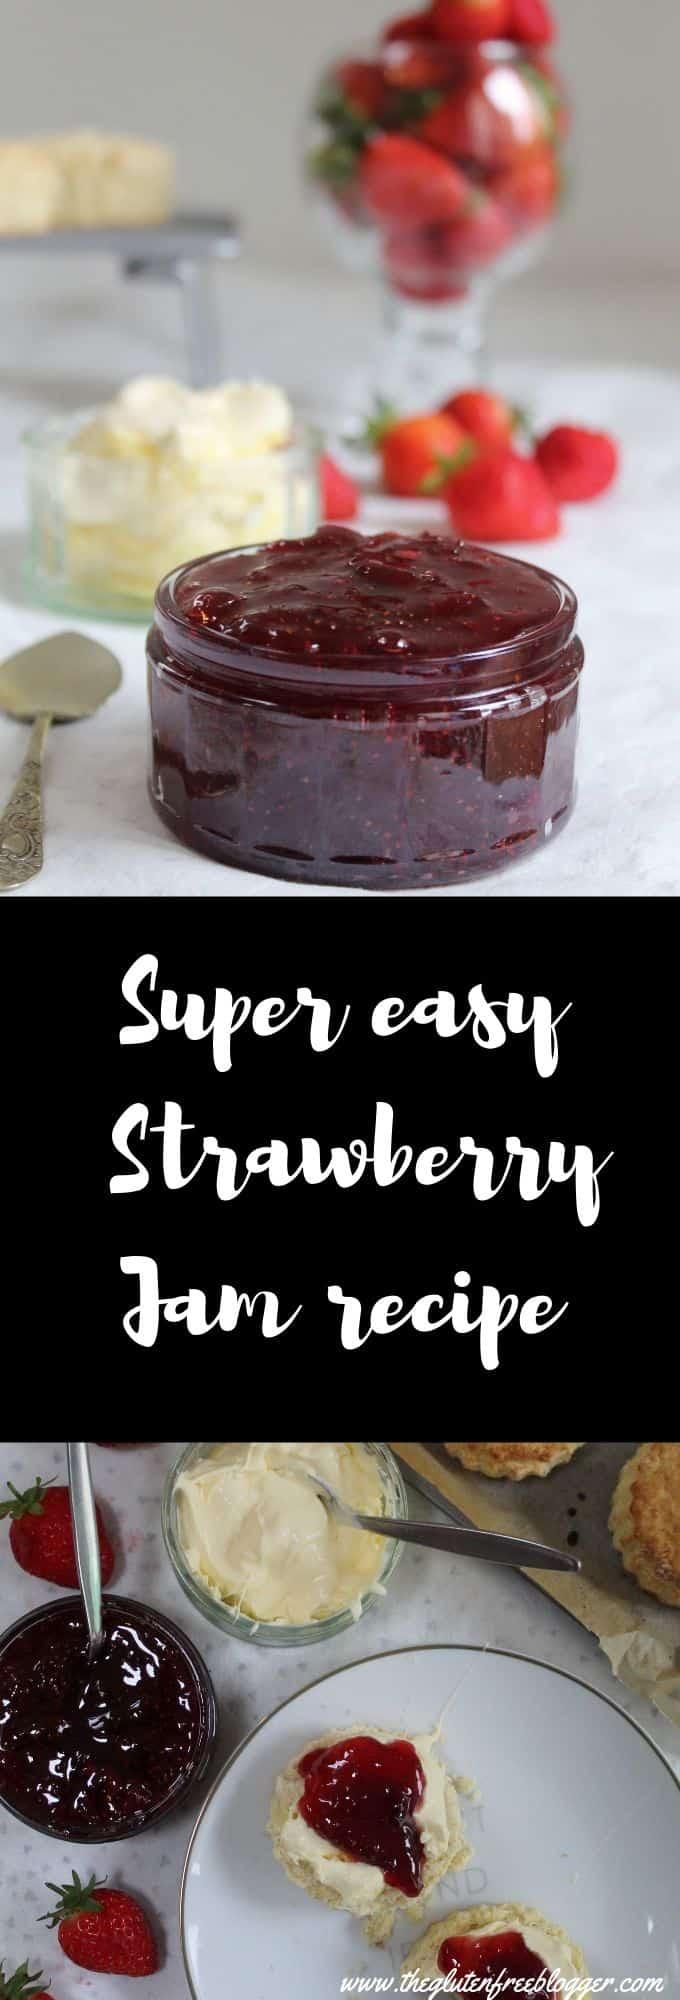 Gluten free easy strawberry jam recipe - three ingredient jam - quick jam recipe